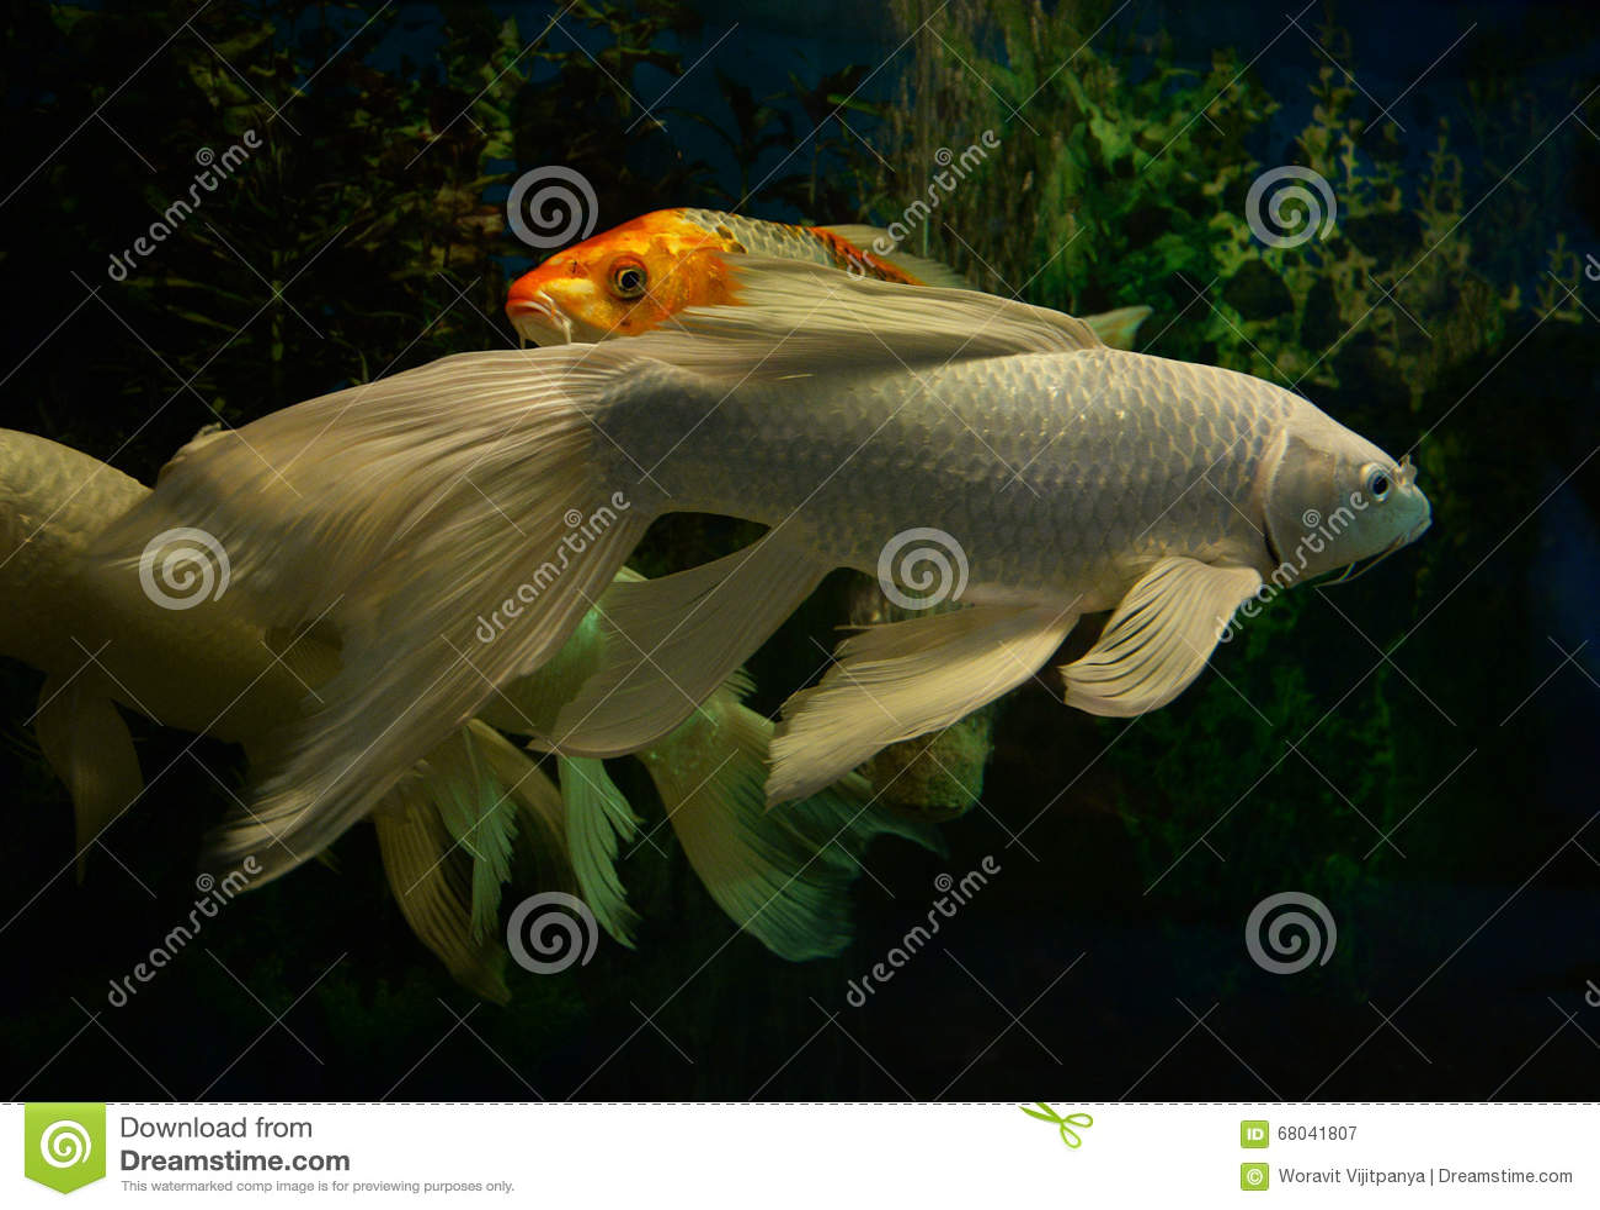 White koi fish stock photo image 68041807 for White koi carp fish